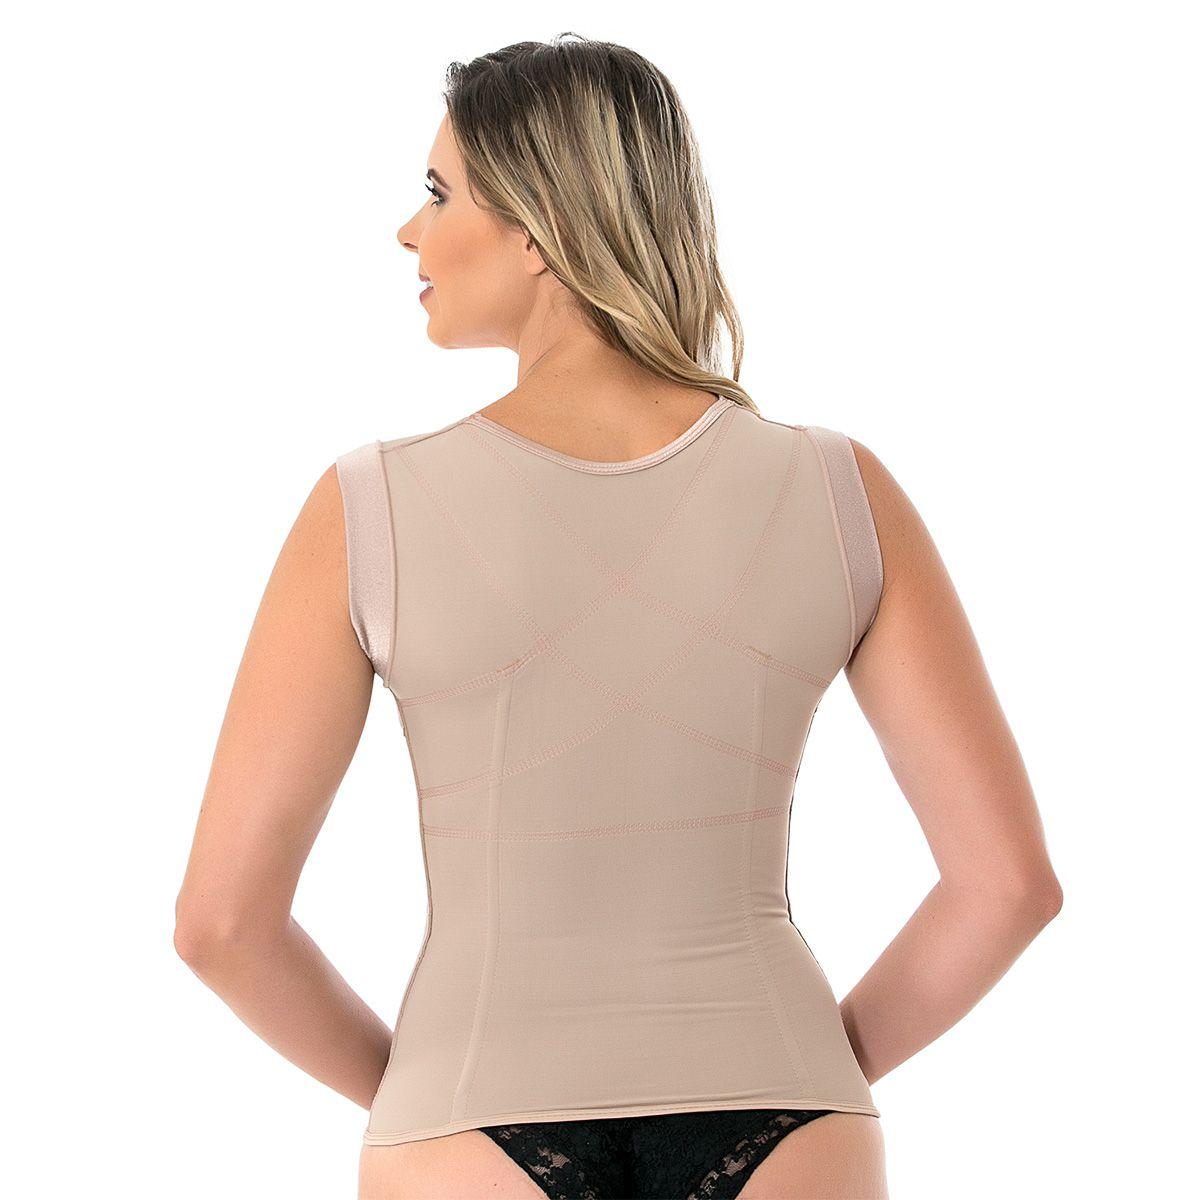 Corretor postural feminino Mabella 1260 c/ reforço costas, alça larga, barbatanas s busto